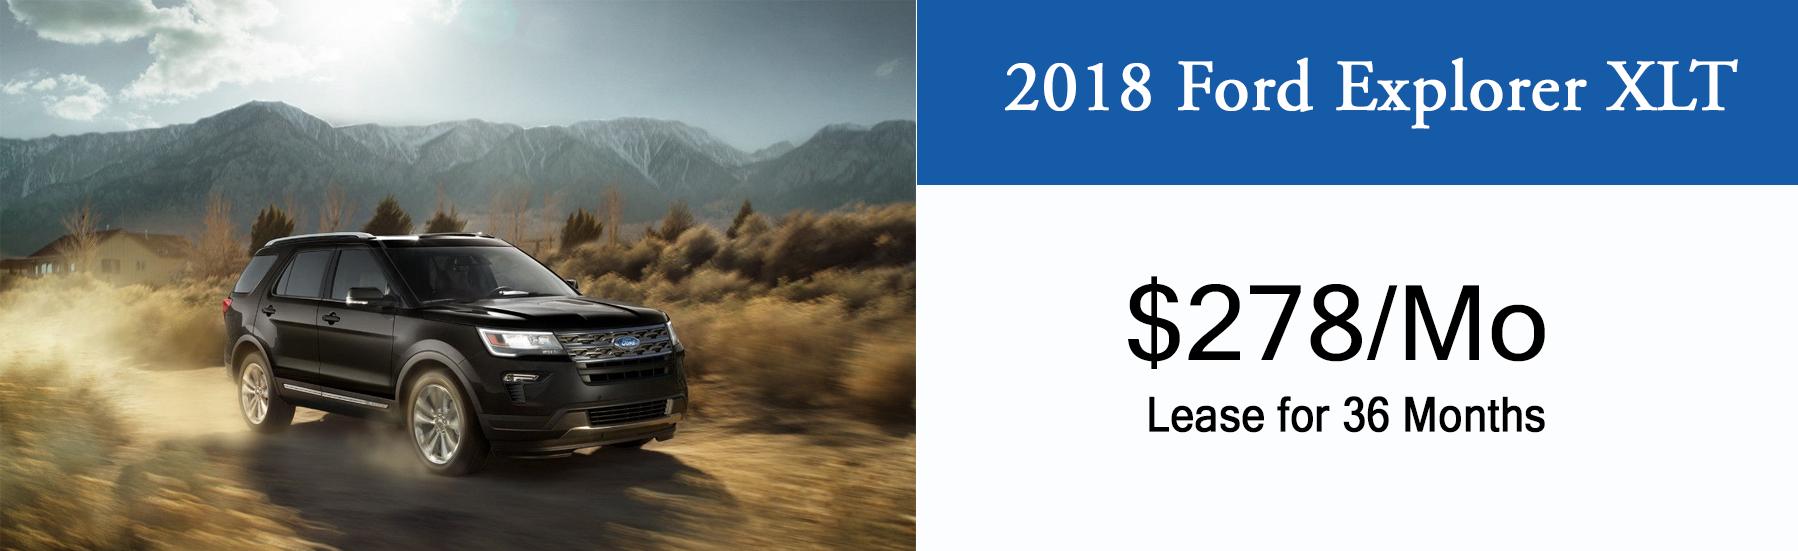 Lansing Ford Explorer Lease Special